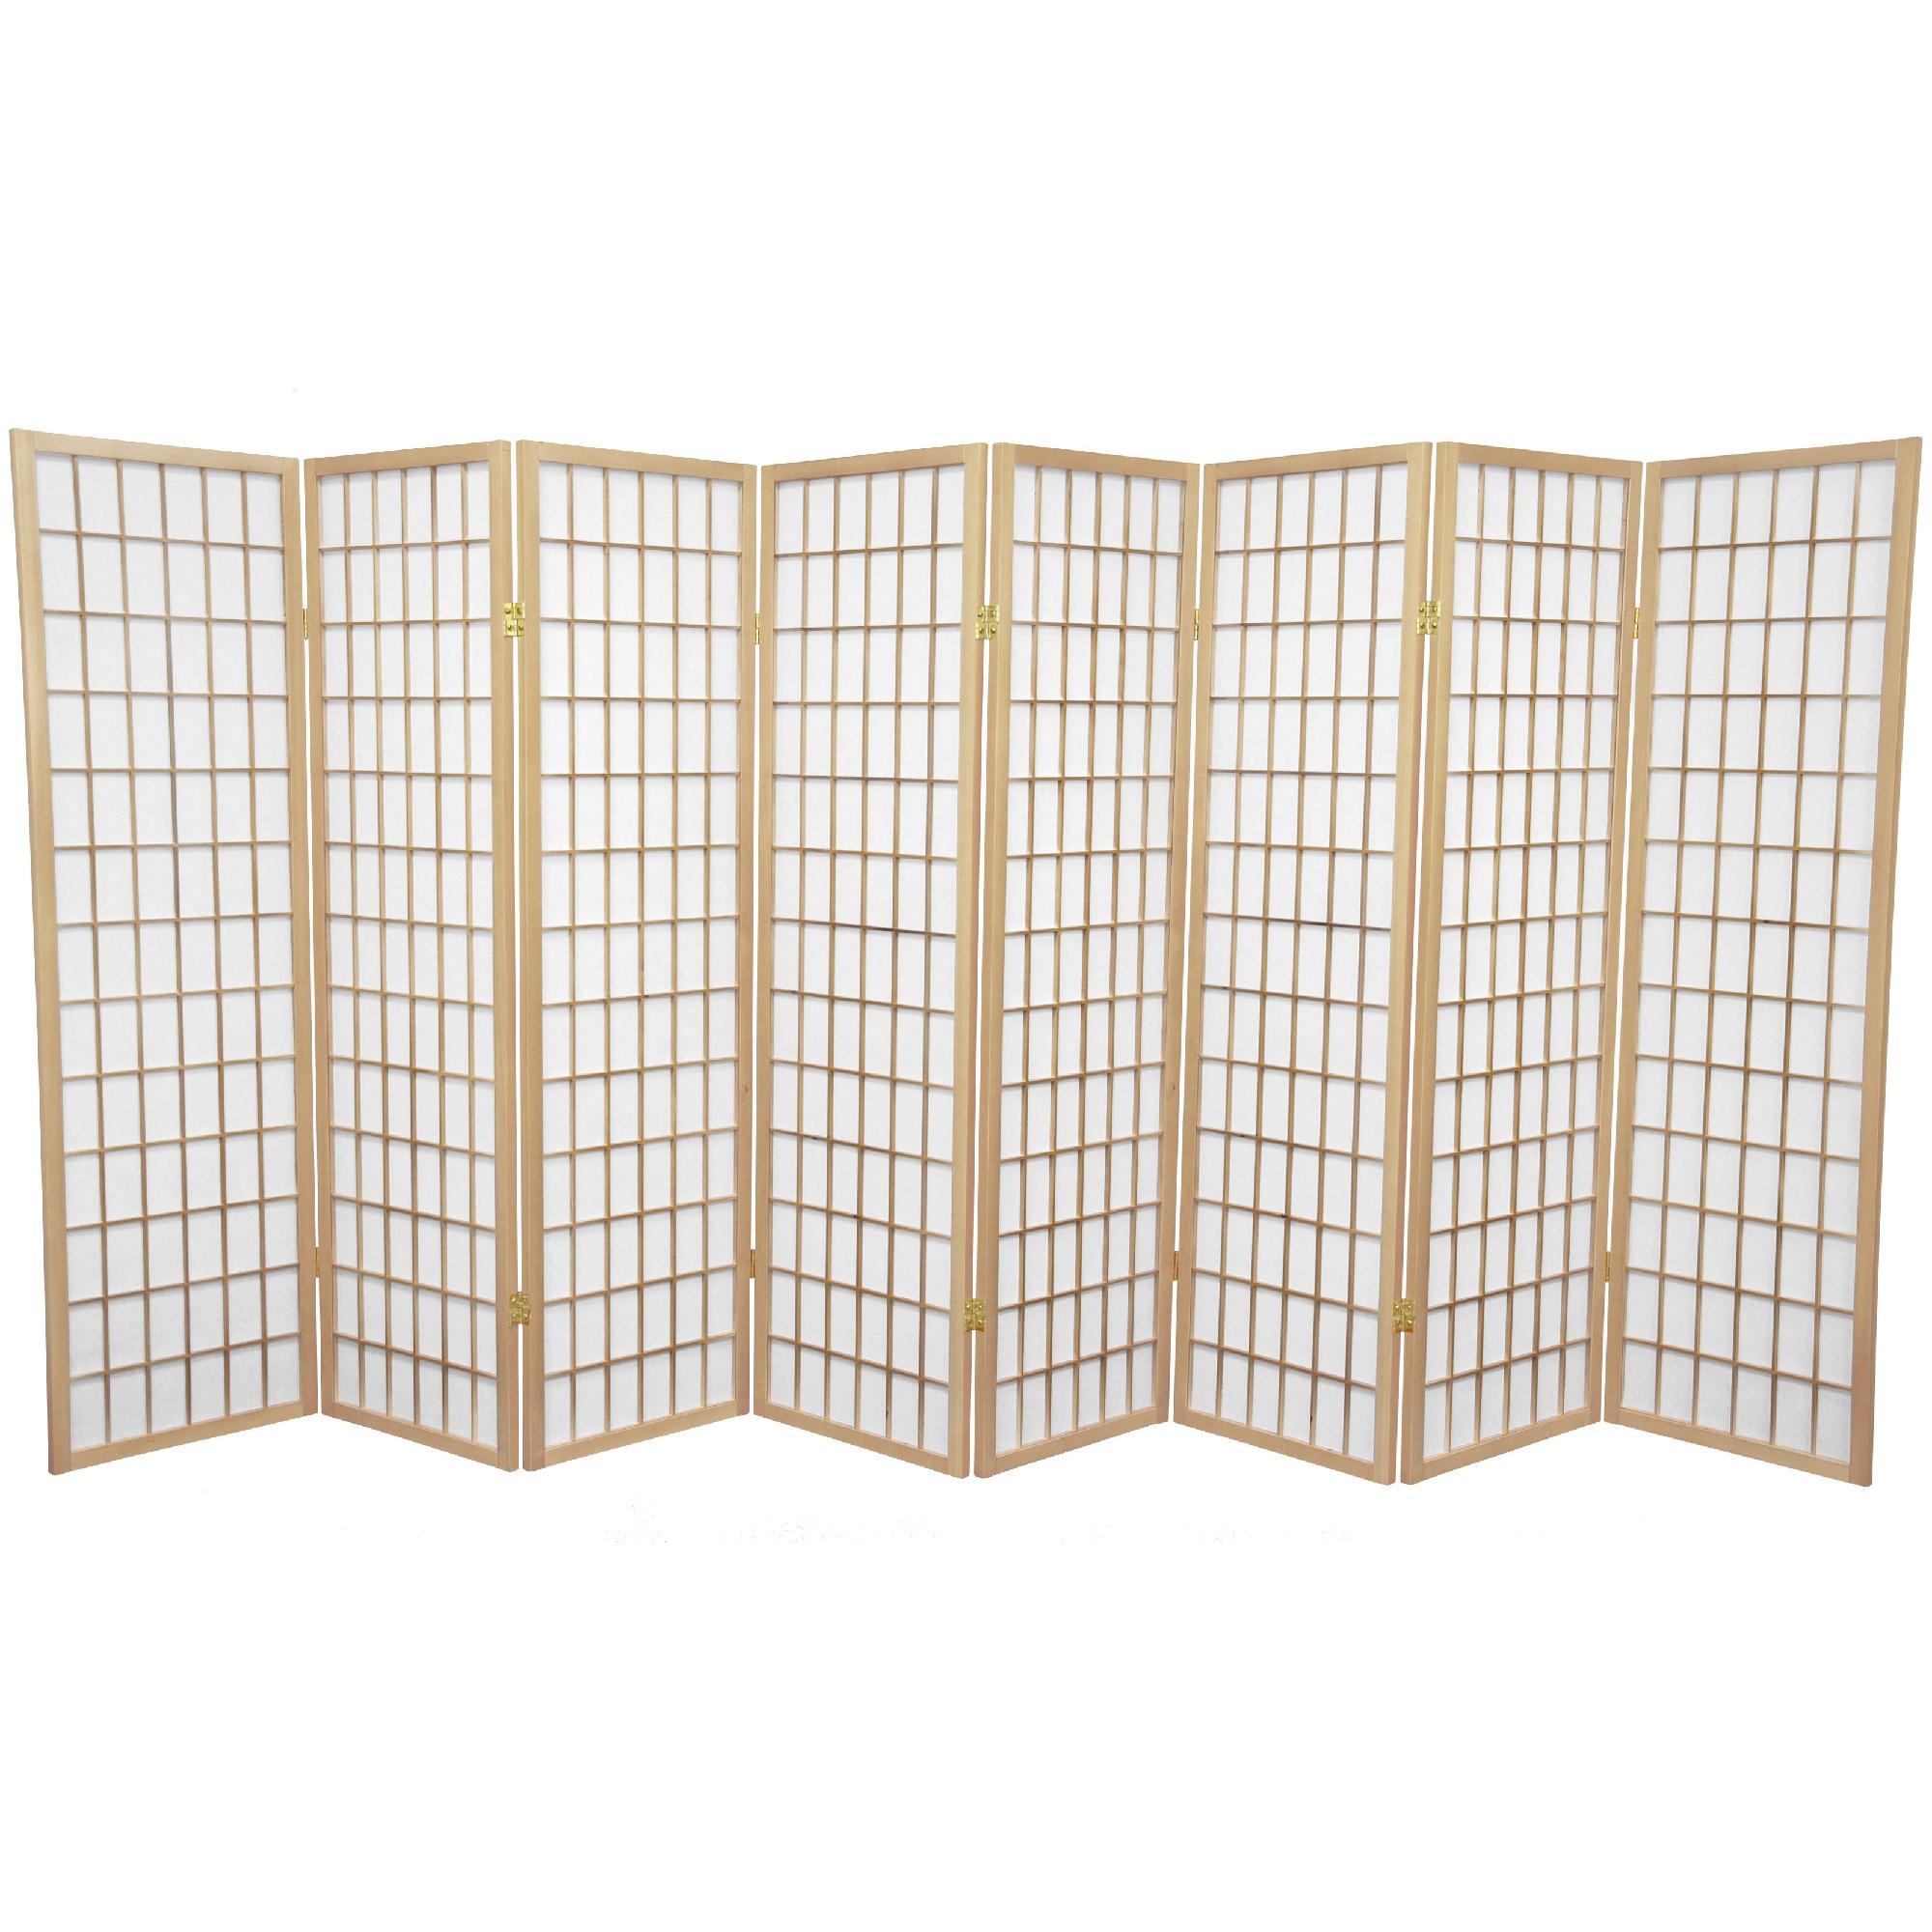 Oriental Furniture 5 ft. Tall Window Pane Shoji Screen - 8 Panel - Natural, Beige & Tan